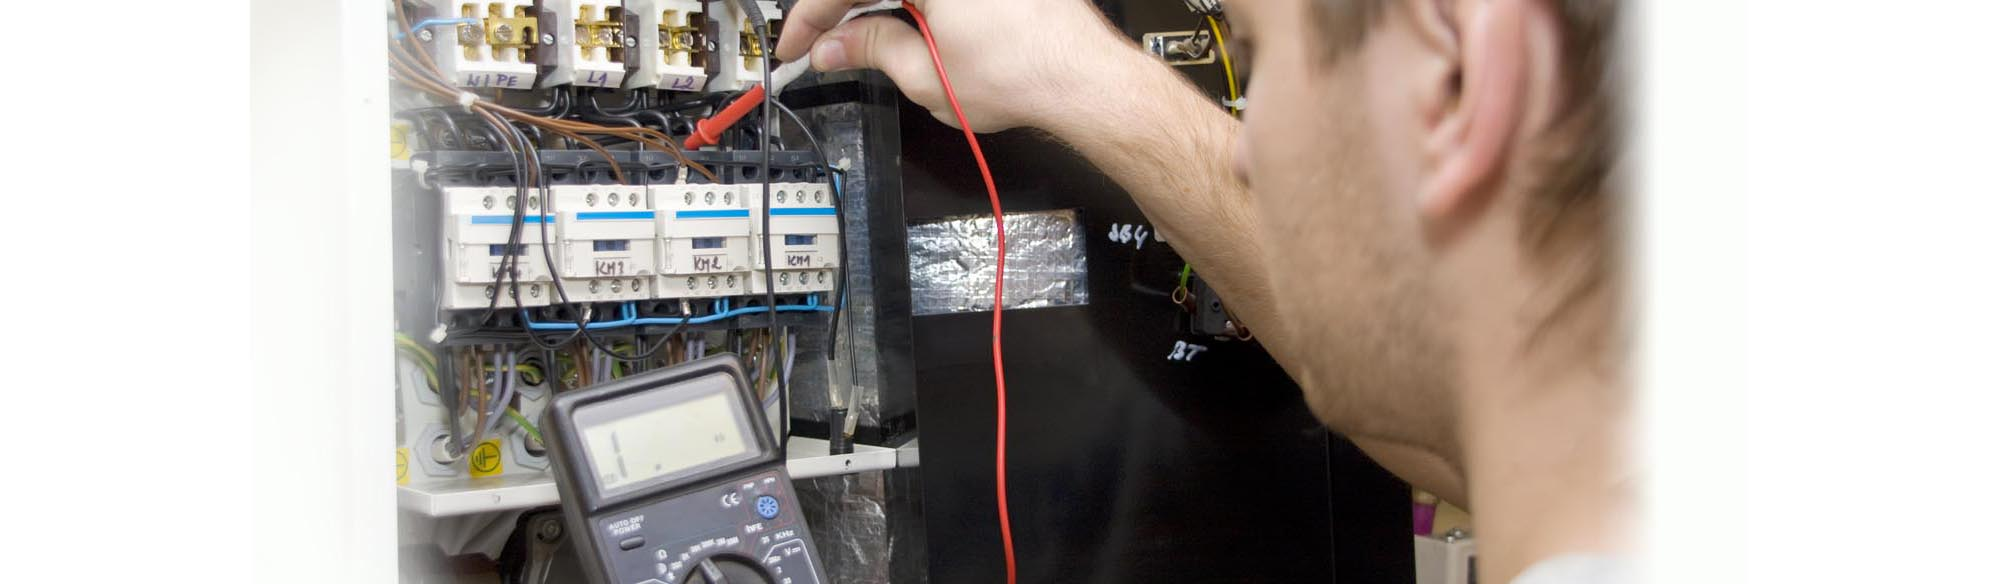 power-maintenance | Armbrust Plumbing Inc